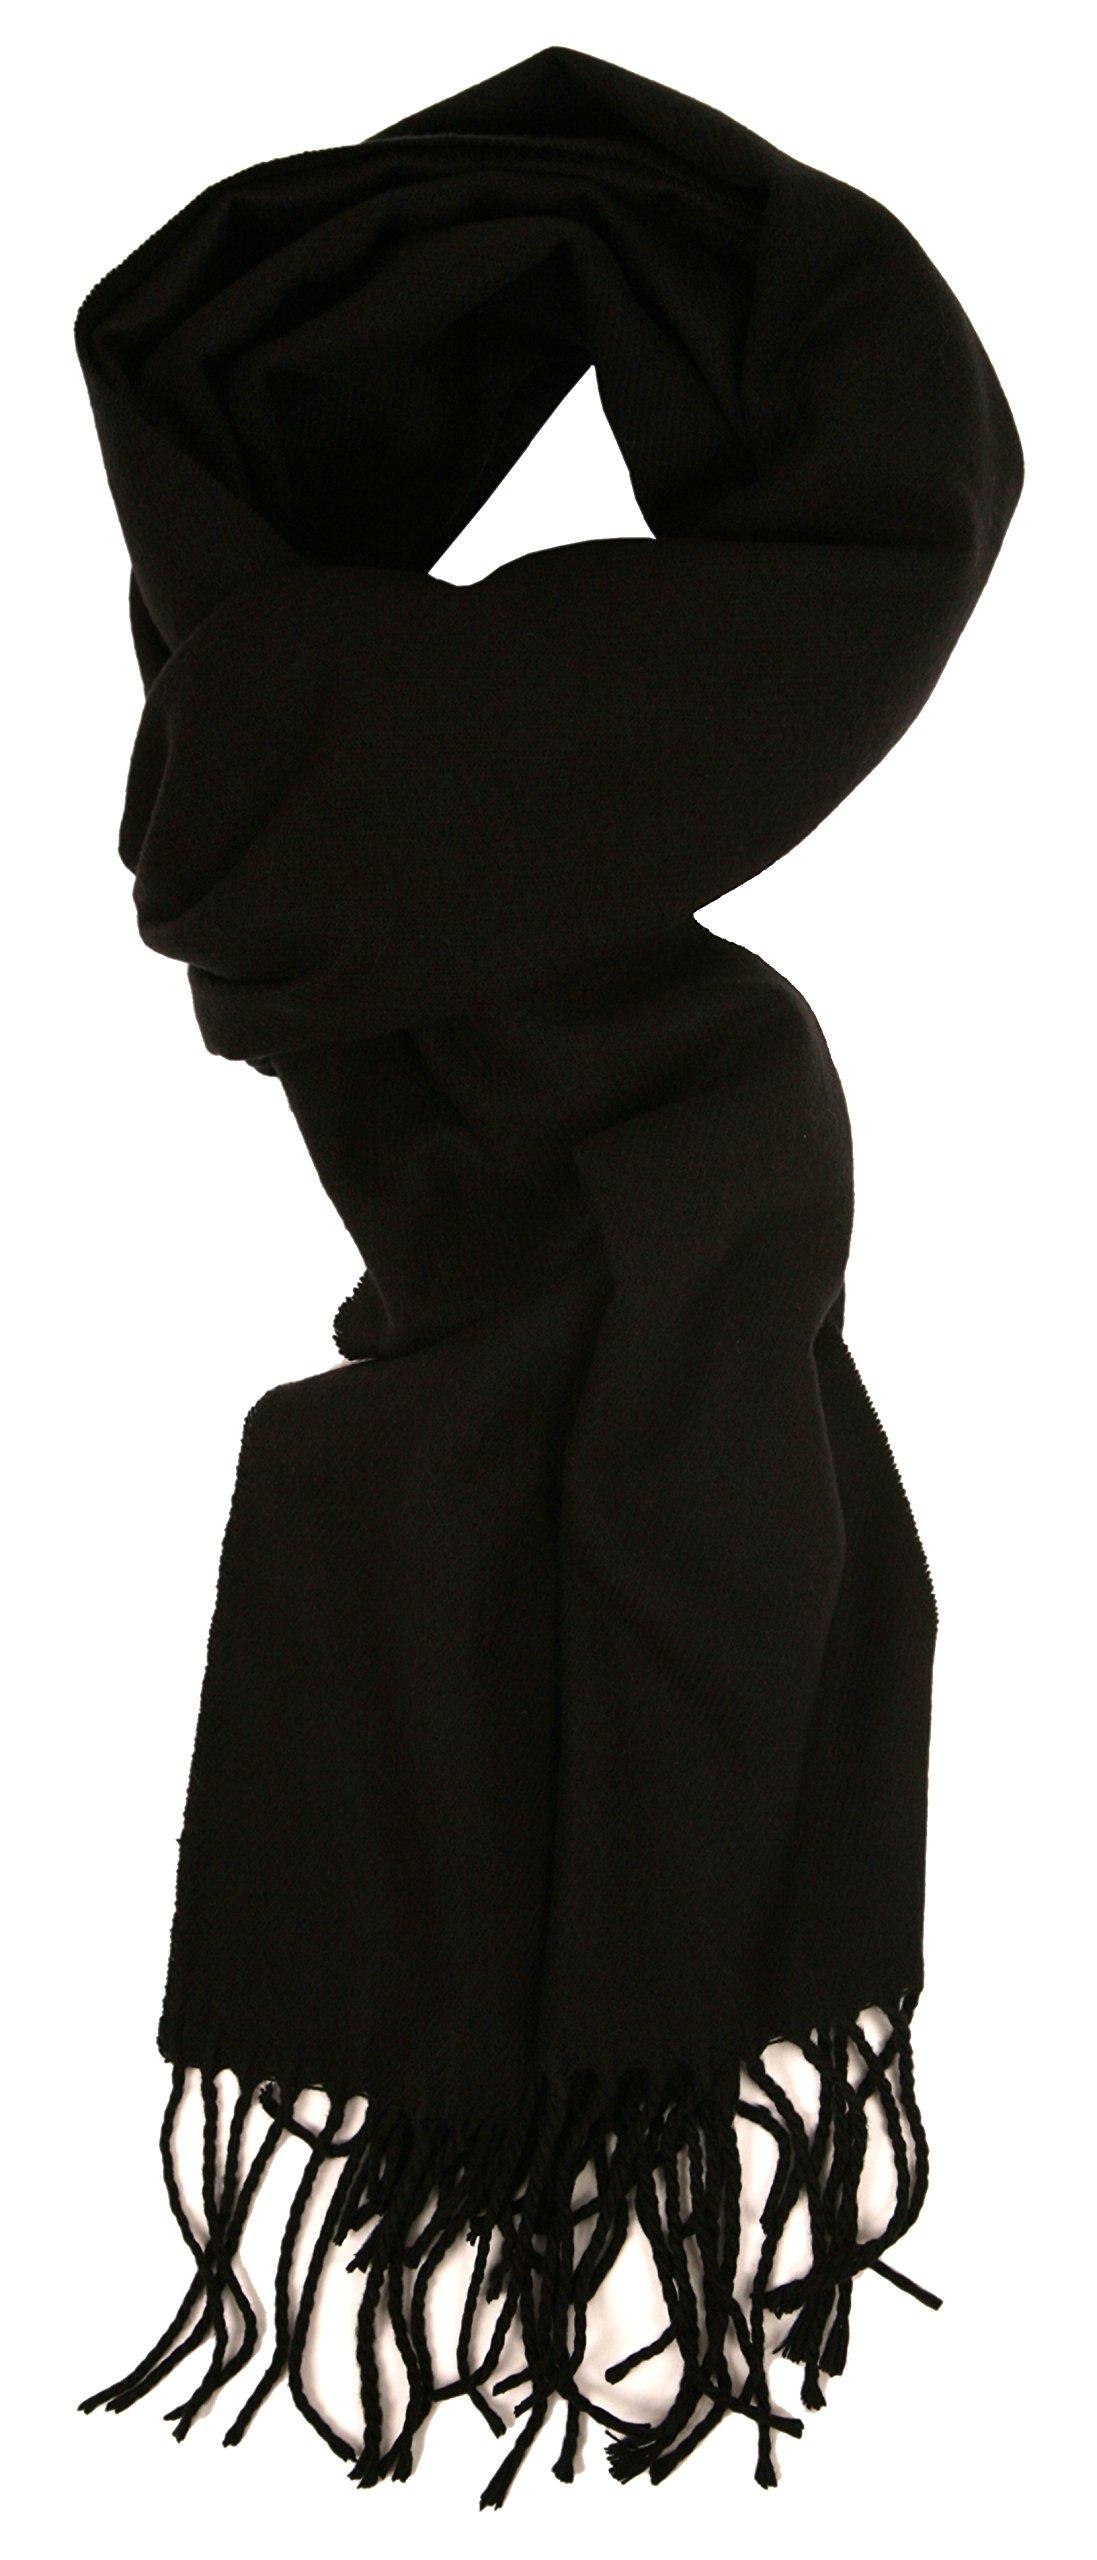 Love Lakeside-Men's Cashmere Feel Winter Solid Color Scarf 00-0 Black